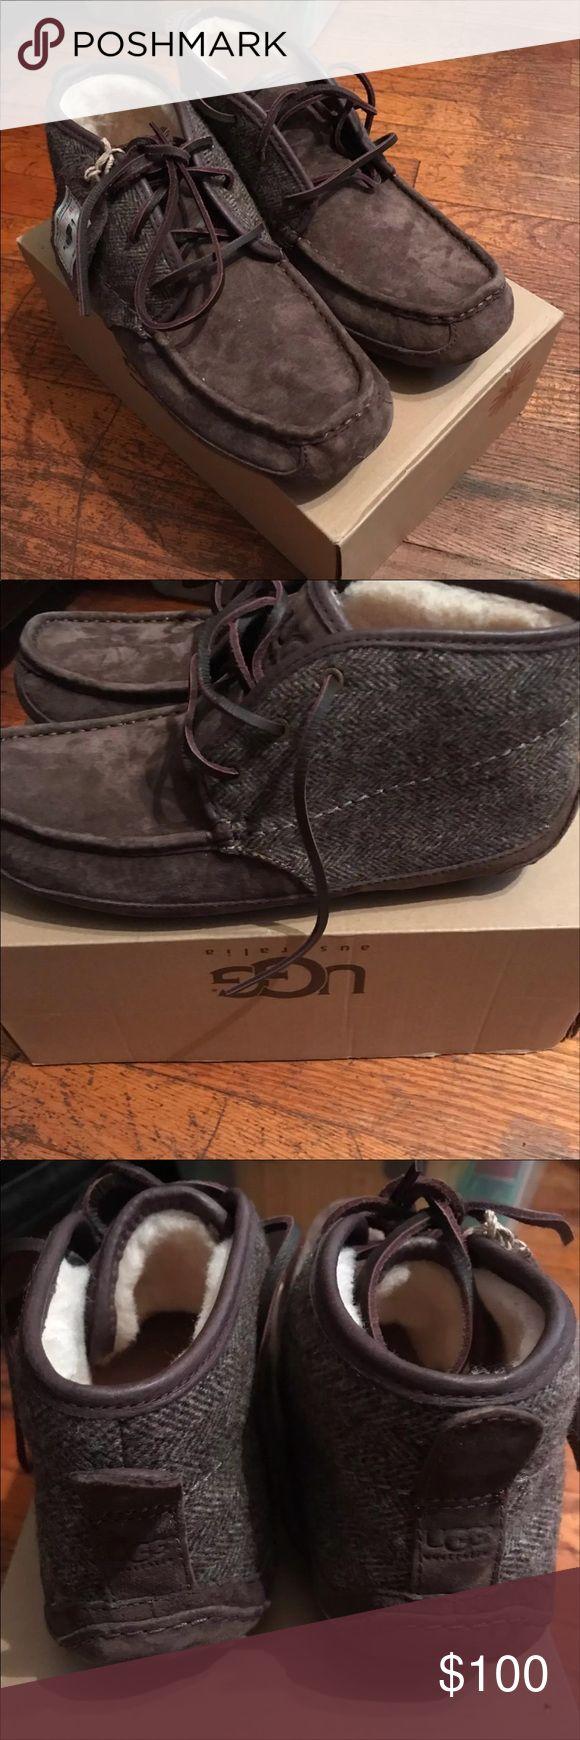 American Eagle Ladies Brown Moccasin Shoe